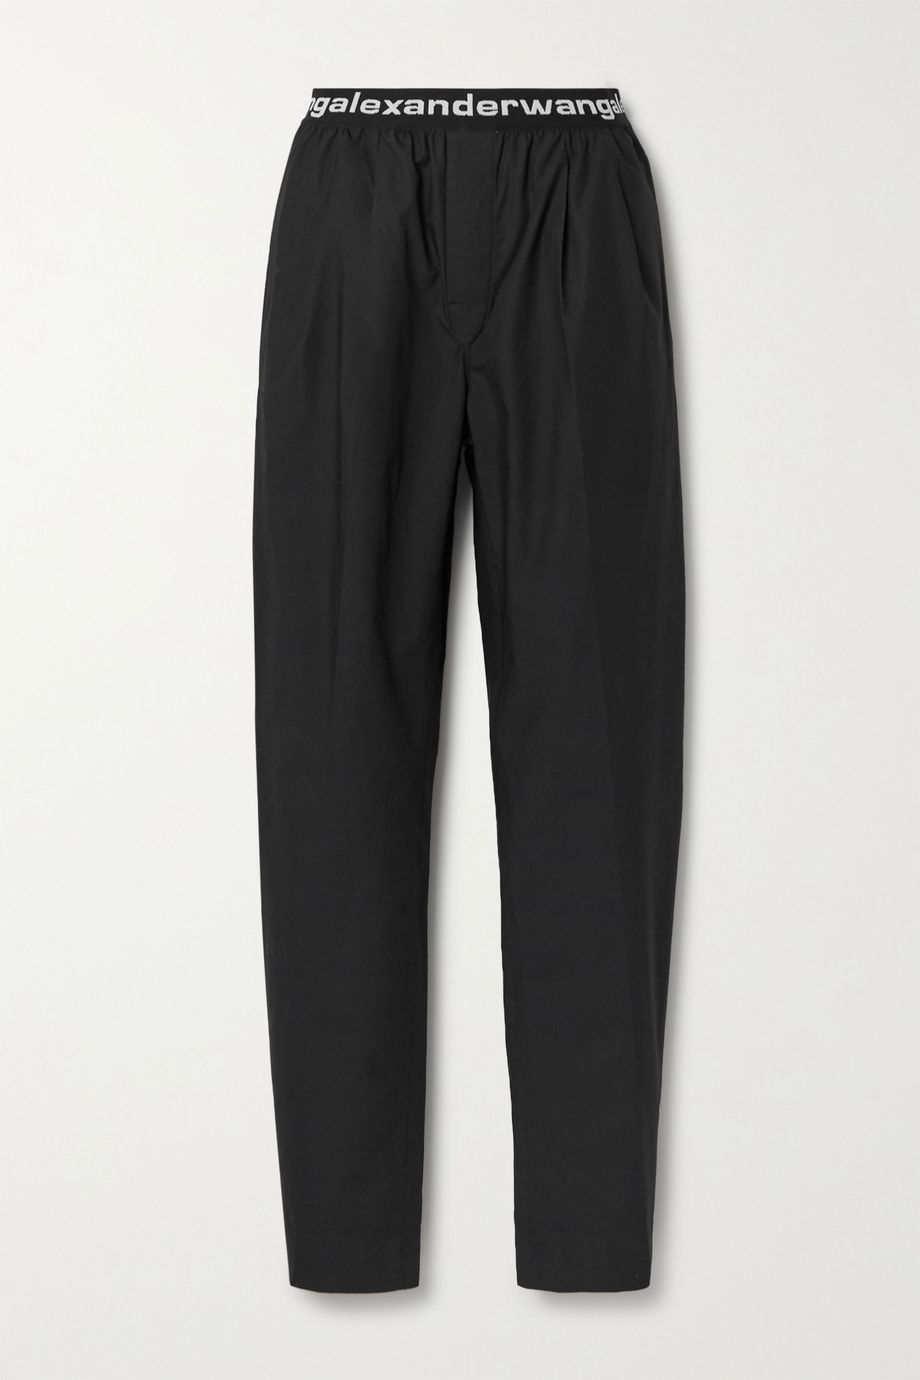 alexanderwang.t Jacquard-trimmed cotton-poplin straight-leg pants